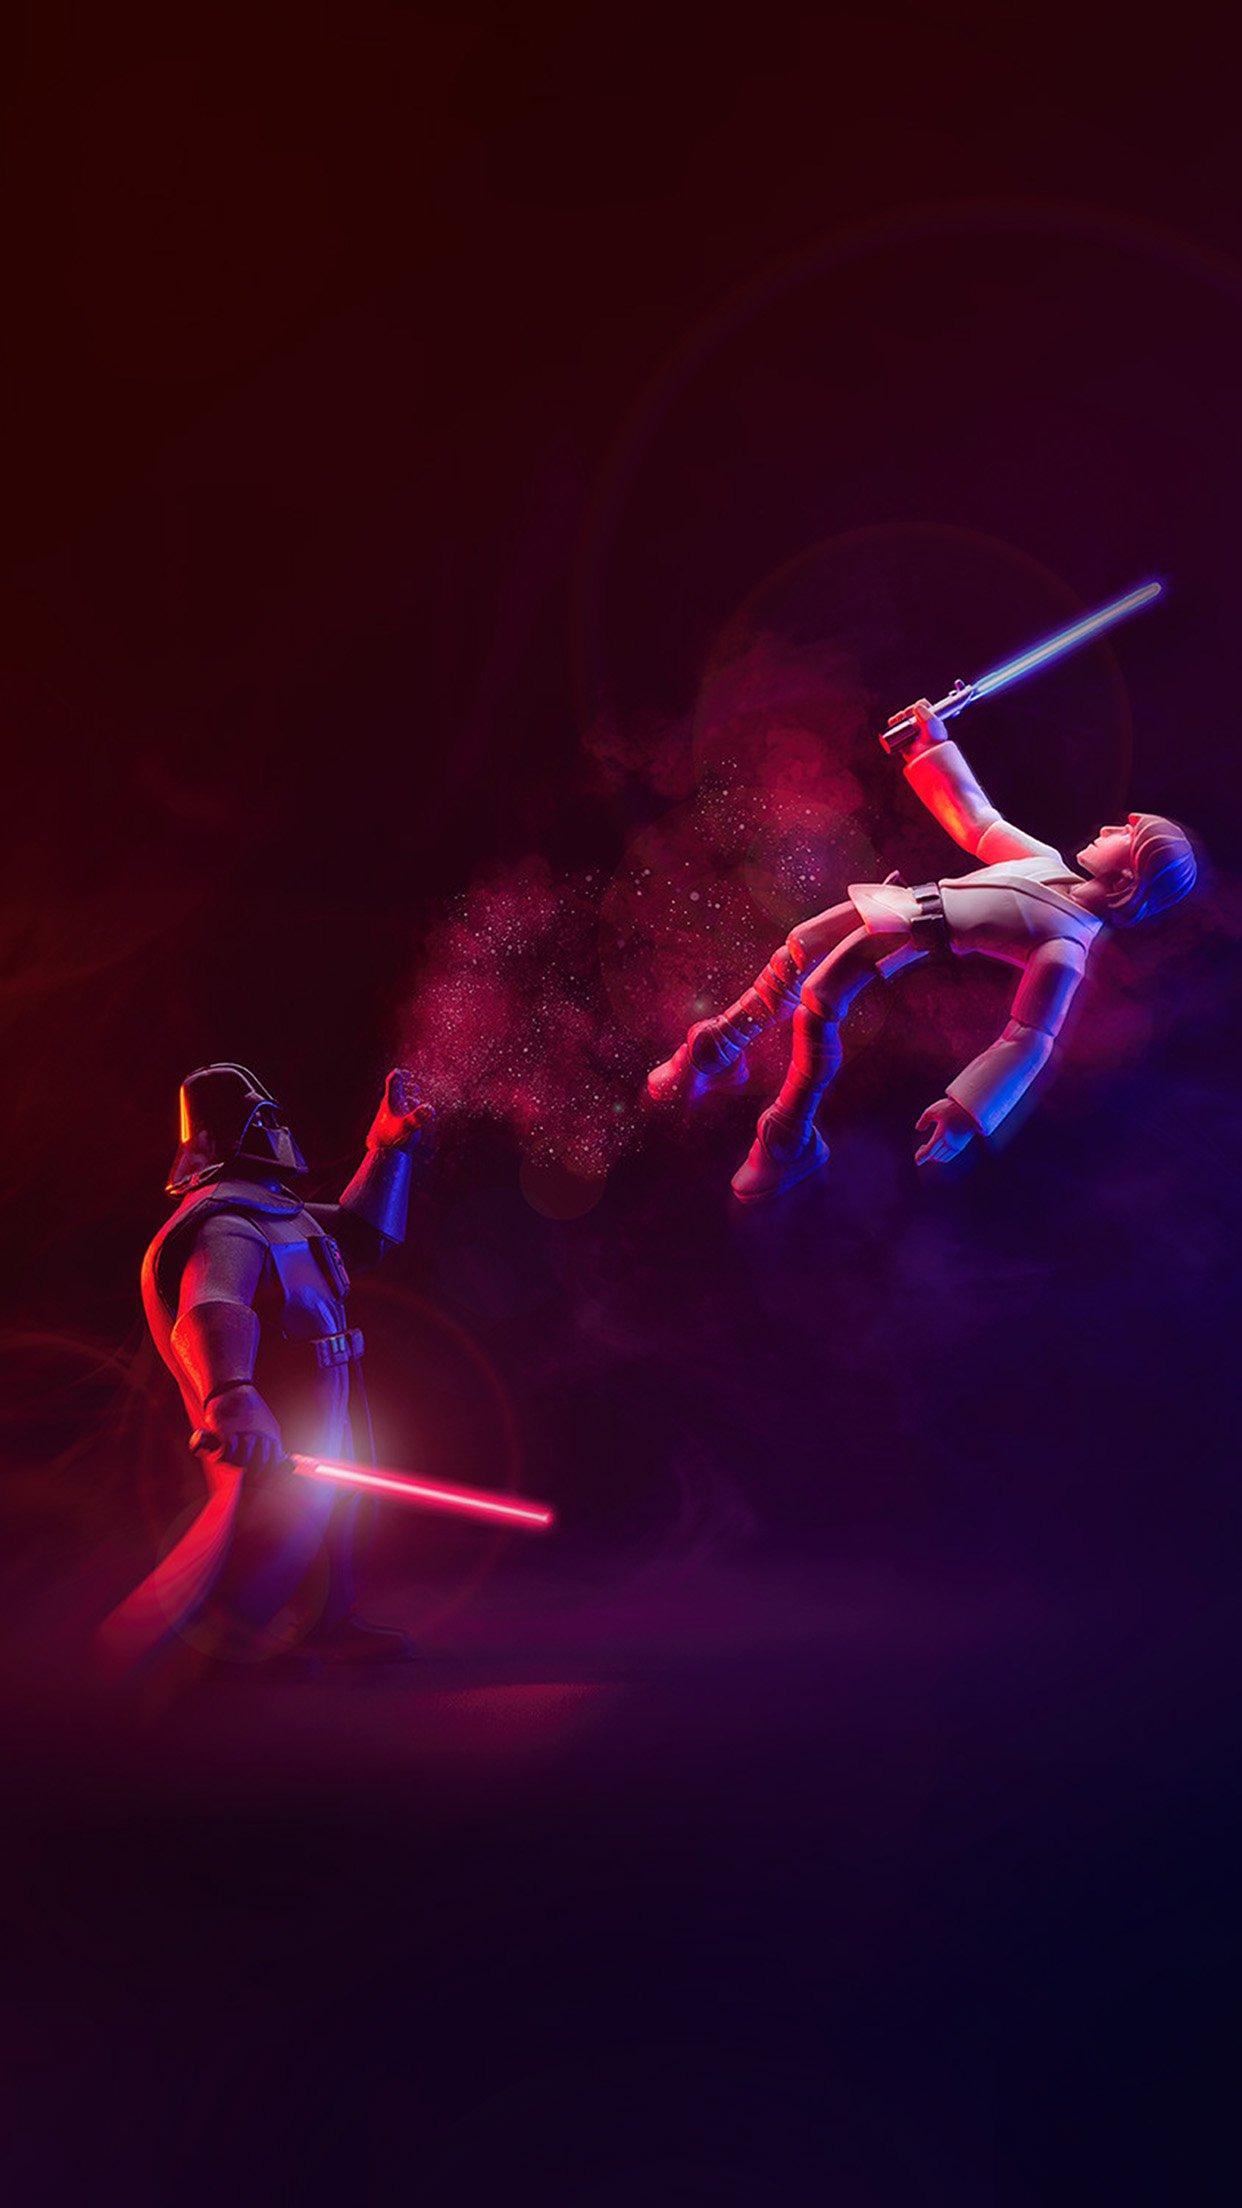 Star Wars Moving Wallpaper Posted By Sarah Tremblay